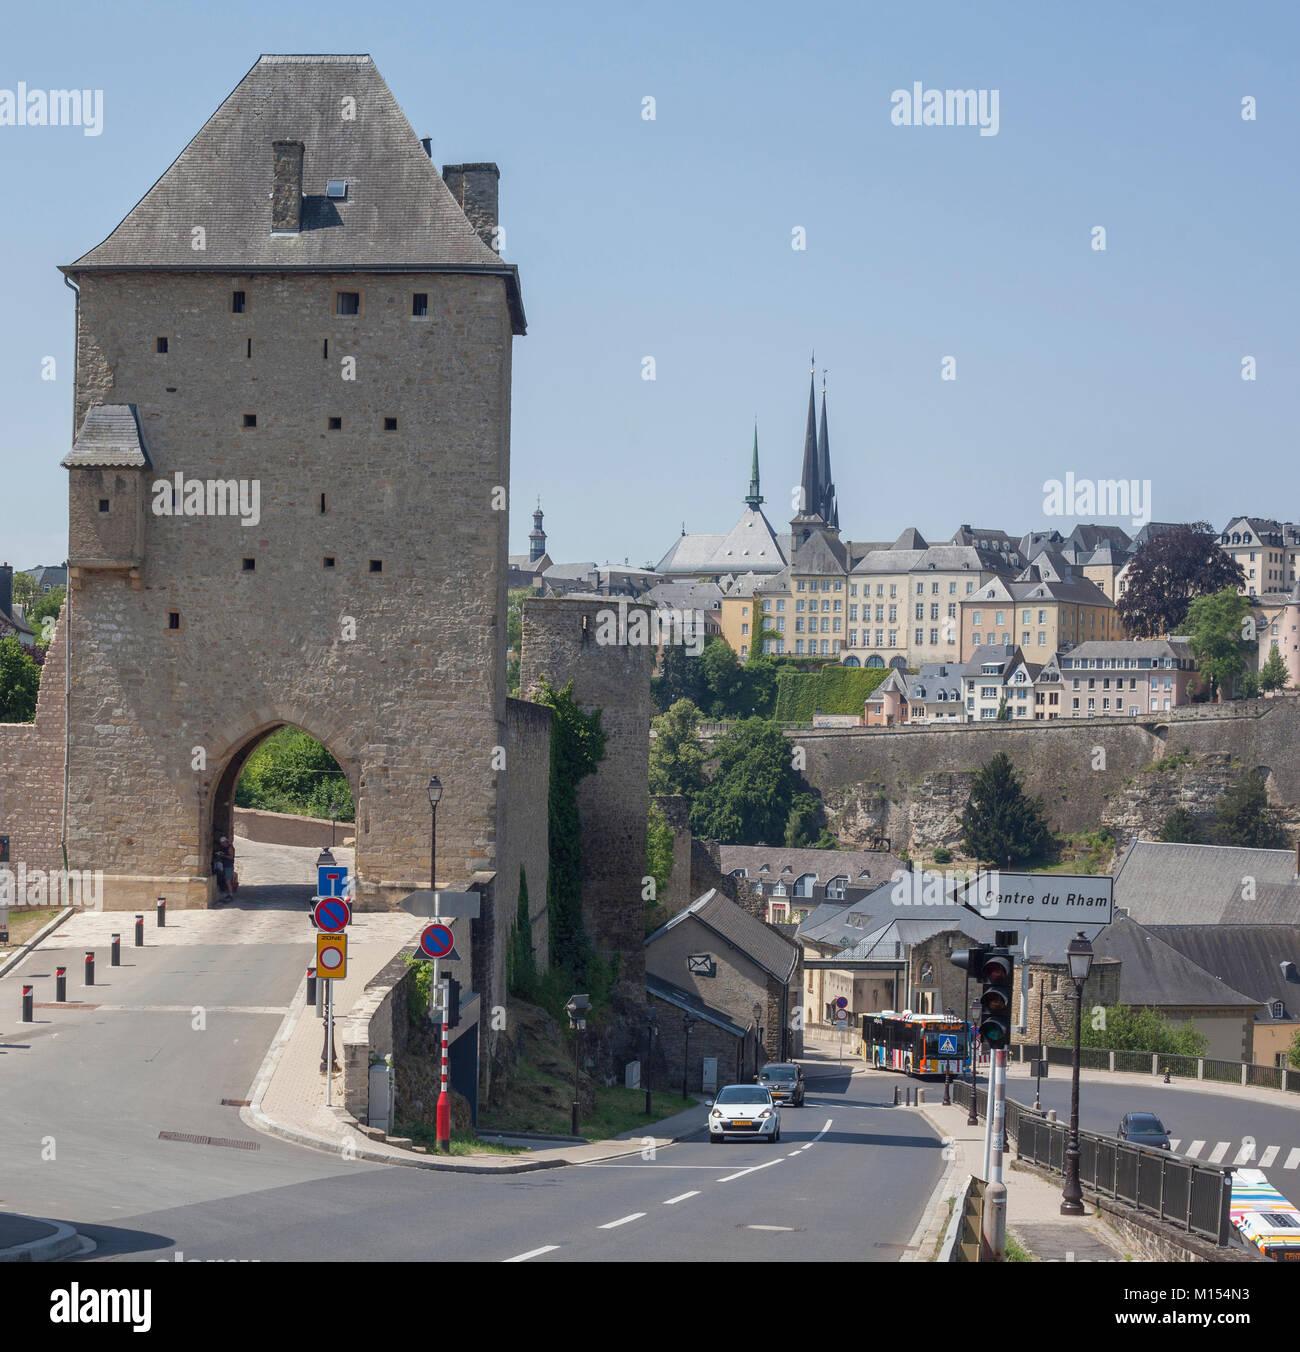 Dinselpuert Tor, Luxemburg-stadt, Luxemburg, Europa ich Dinselpuert Tor mit dem Rham-Plateau in Luxemburg-Stadt, Stockbild